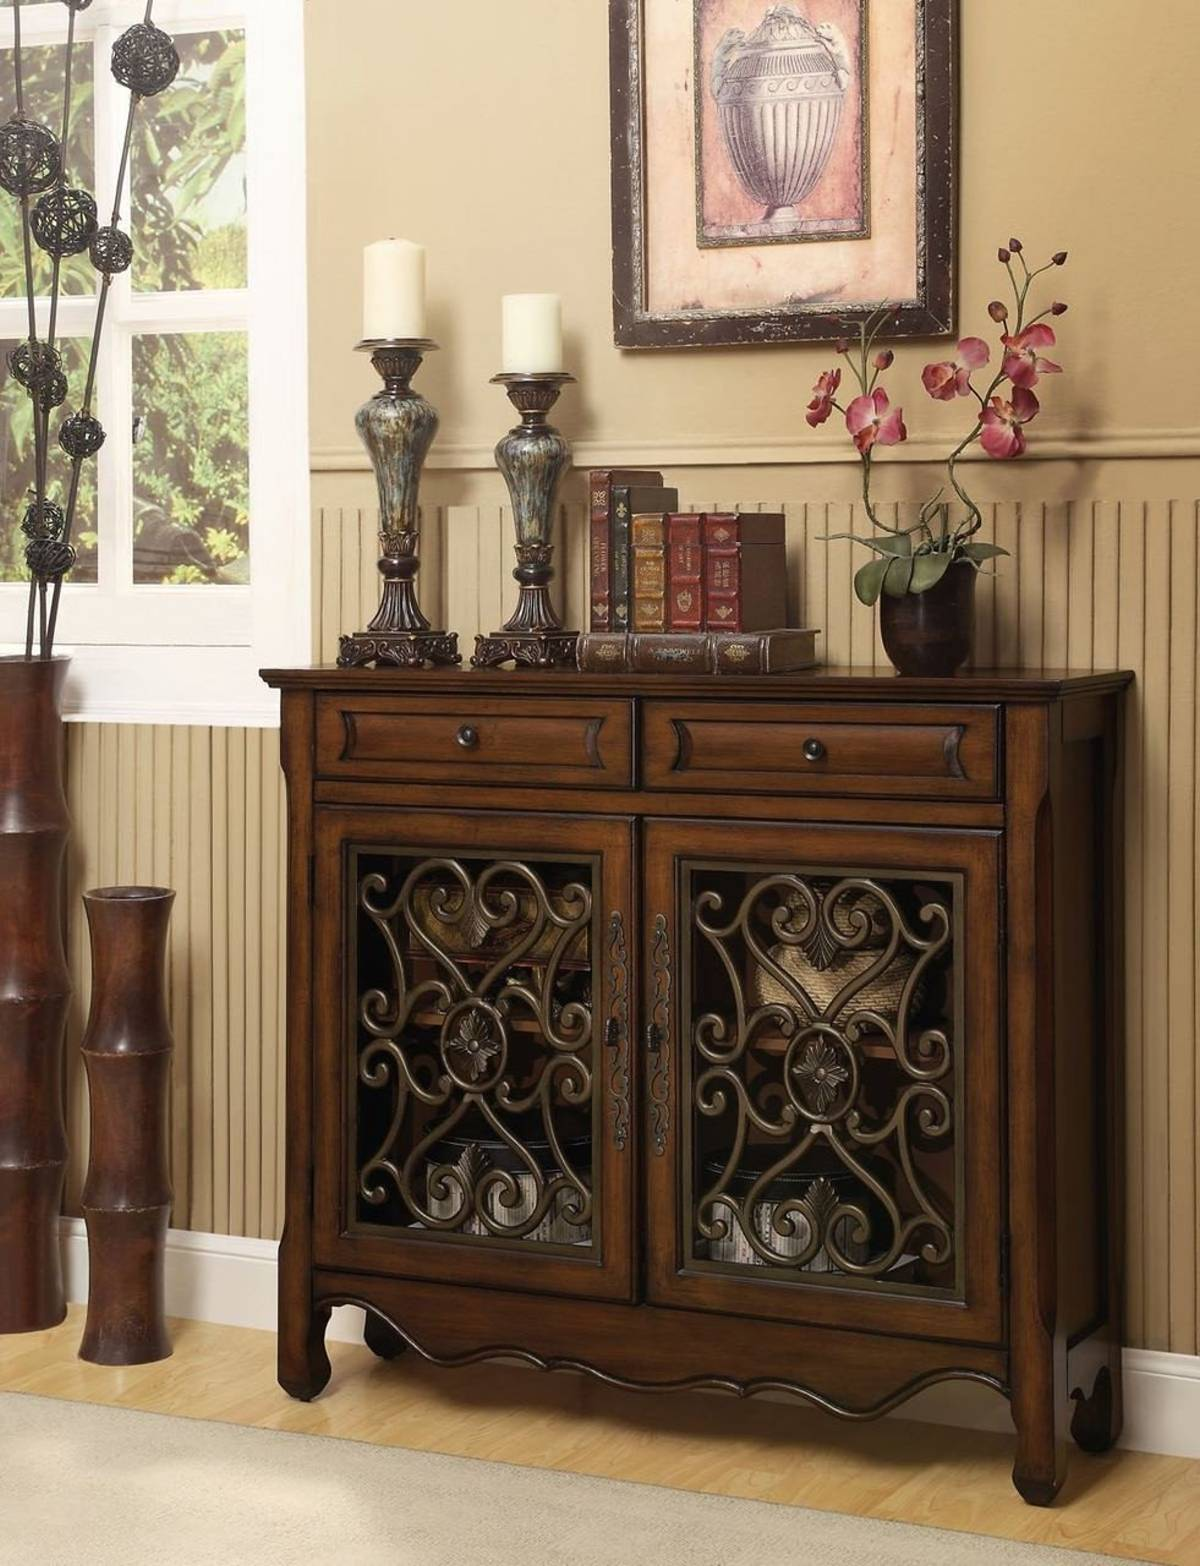 56416 Cupboard Hollin Brown & Bronze Metal Cupboard $305